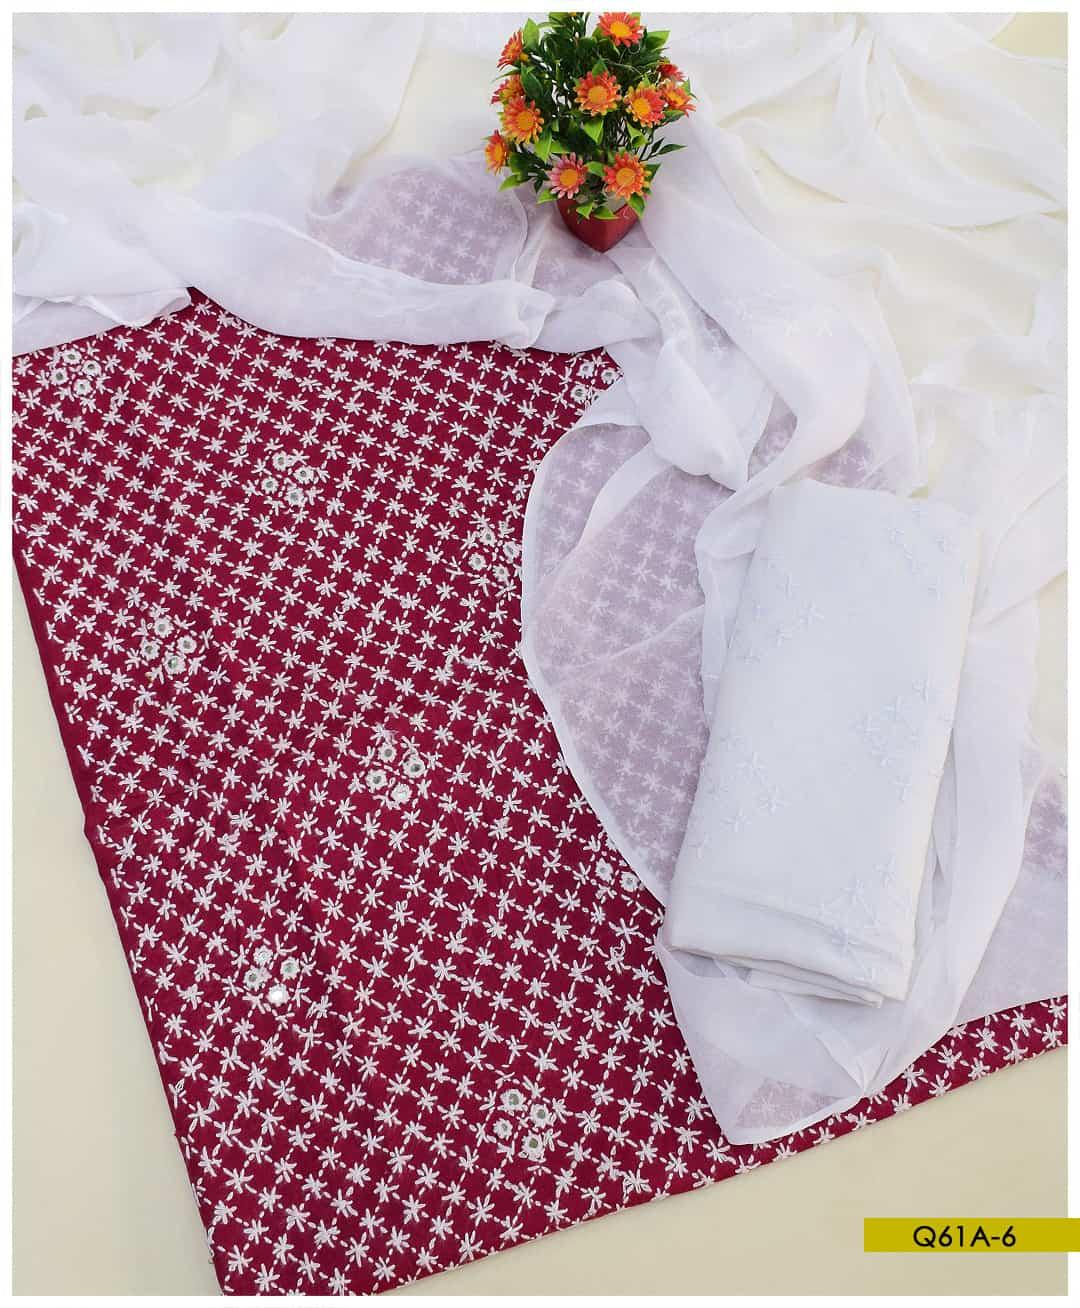 3 PCs Un-Stitched Chawal Sheesha Work Hand Embroidery Suits With Chiffon Dupatta - Q61A6